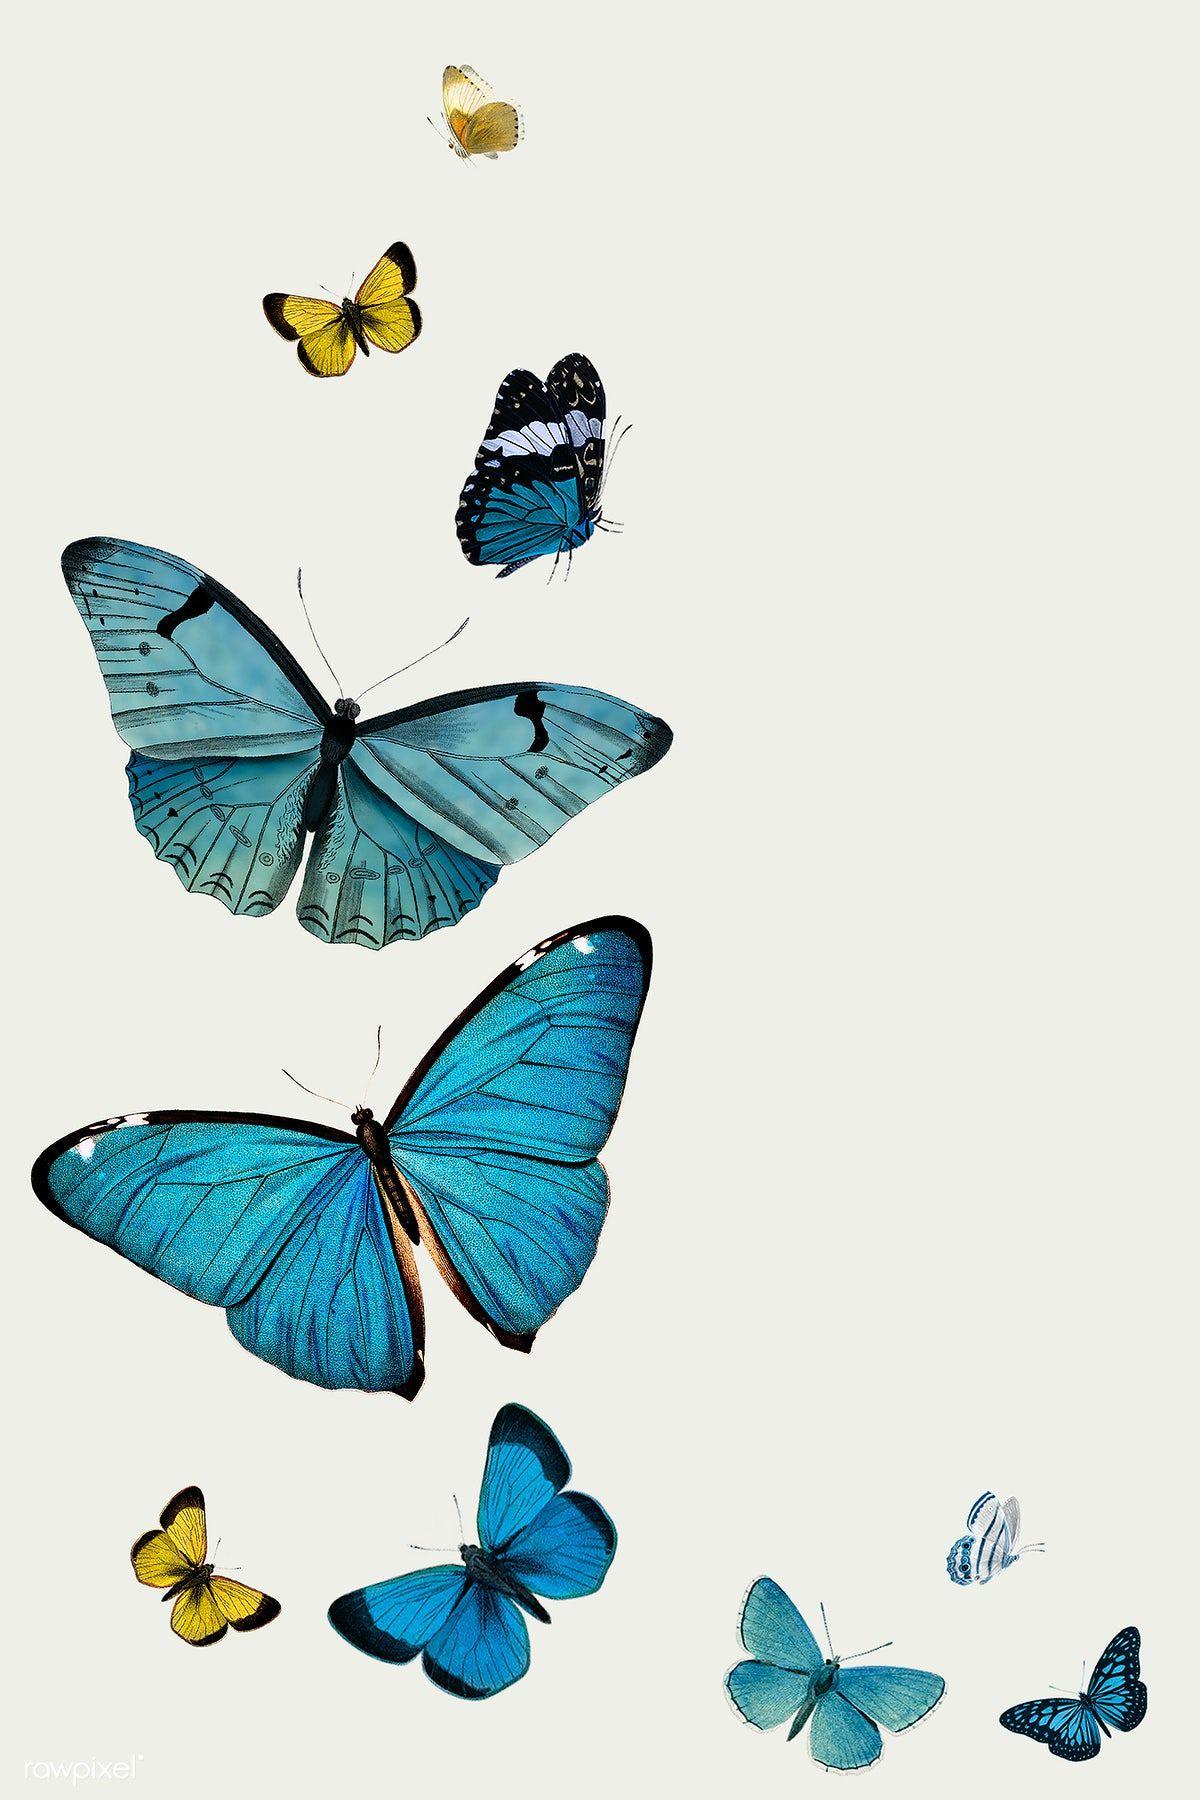 Download Premium Illustration Of Vintage Common Blue Butterflies Blue Butterfly Wallpaper Butterfly Wallpaper Iphone Butterfly Illustration